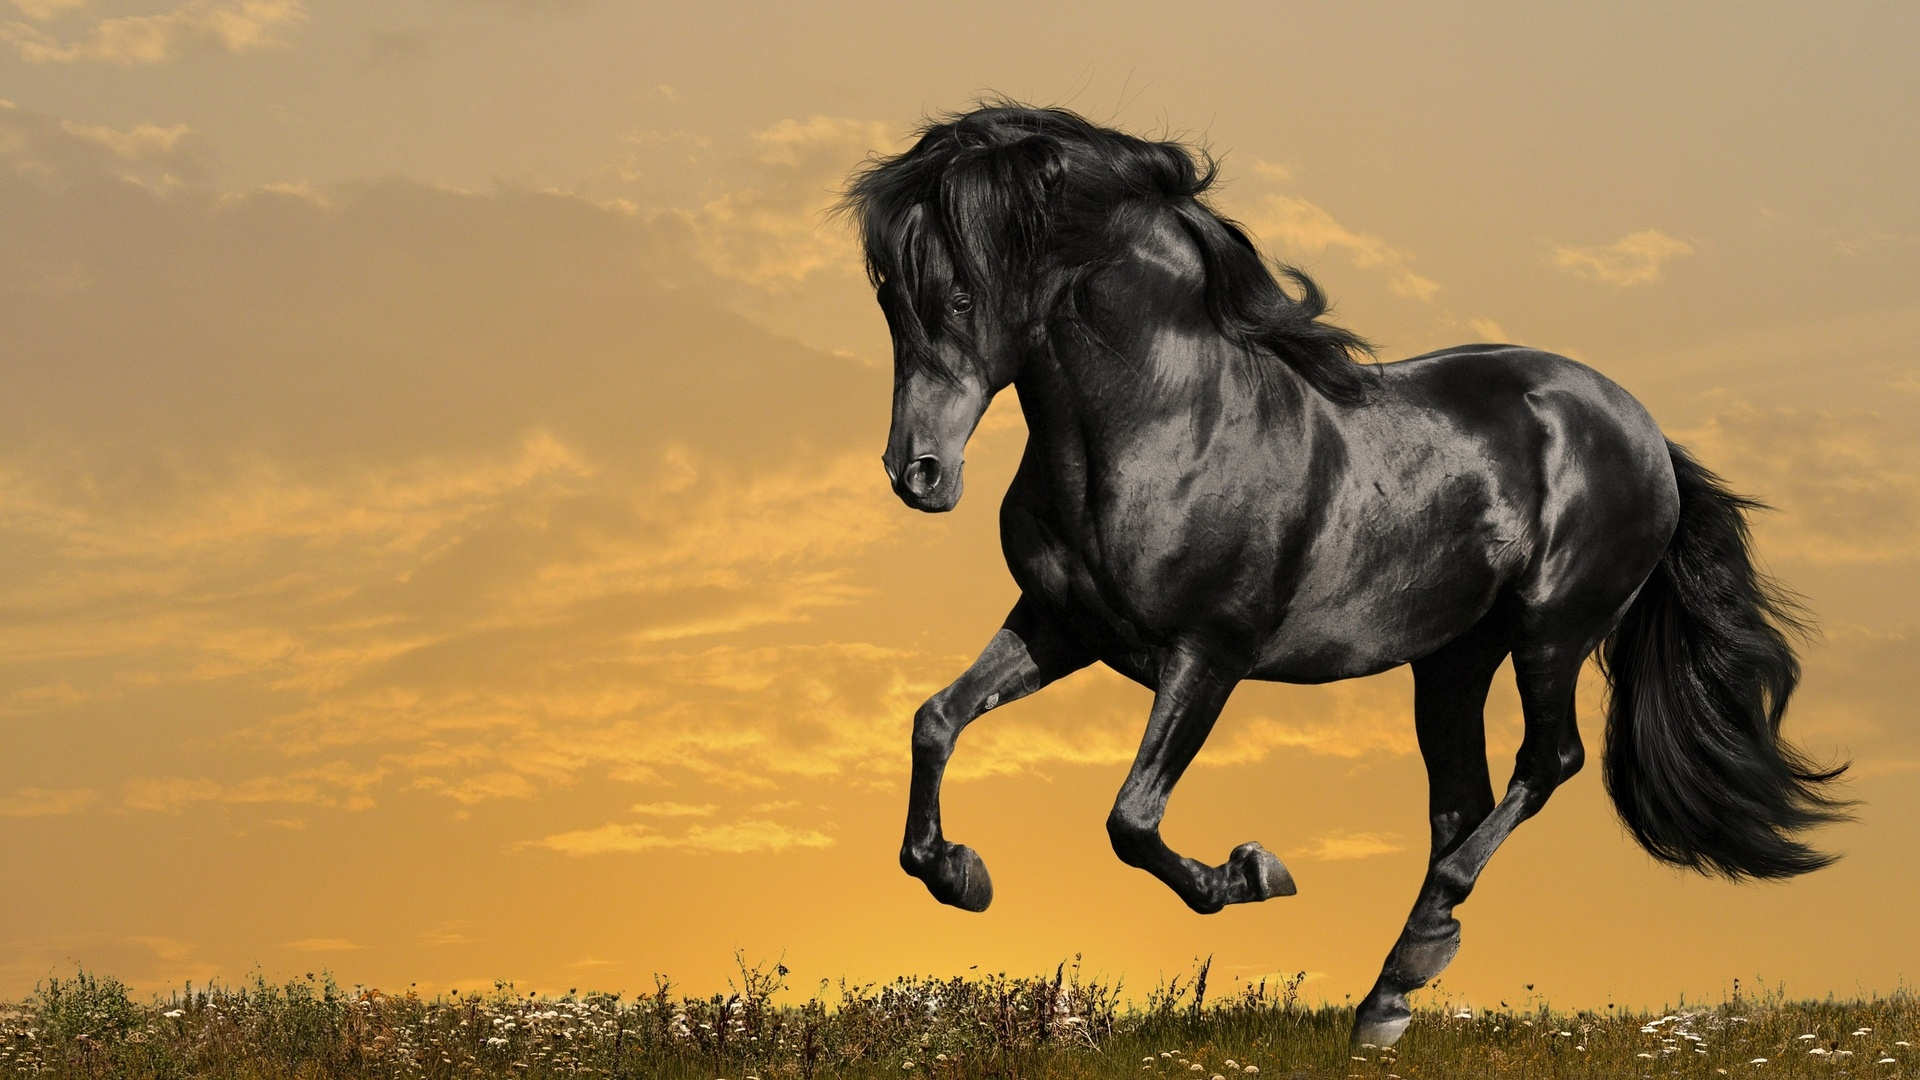 Thanksgiving Fall Wallpaper Download Free Black Horse Backgrounds Pixelstalk Net